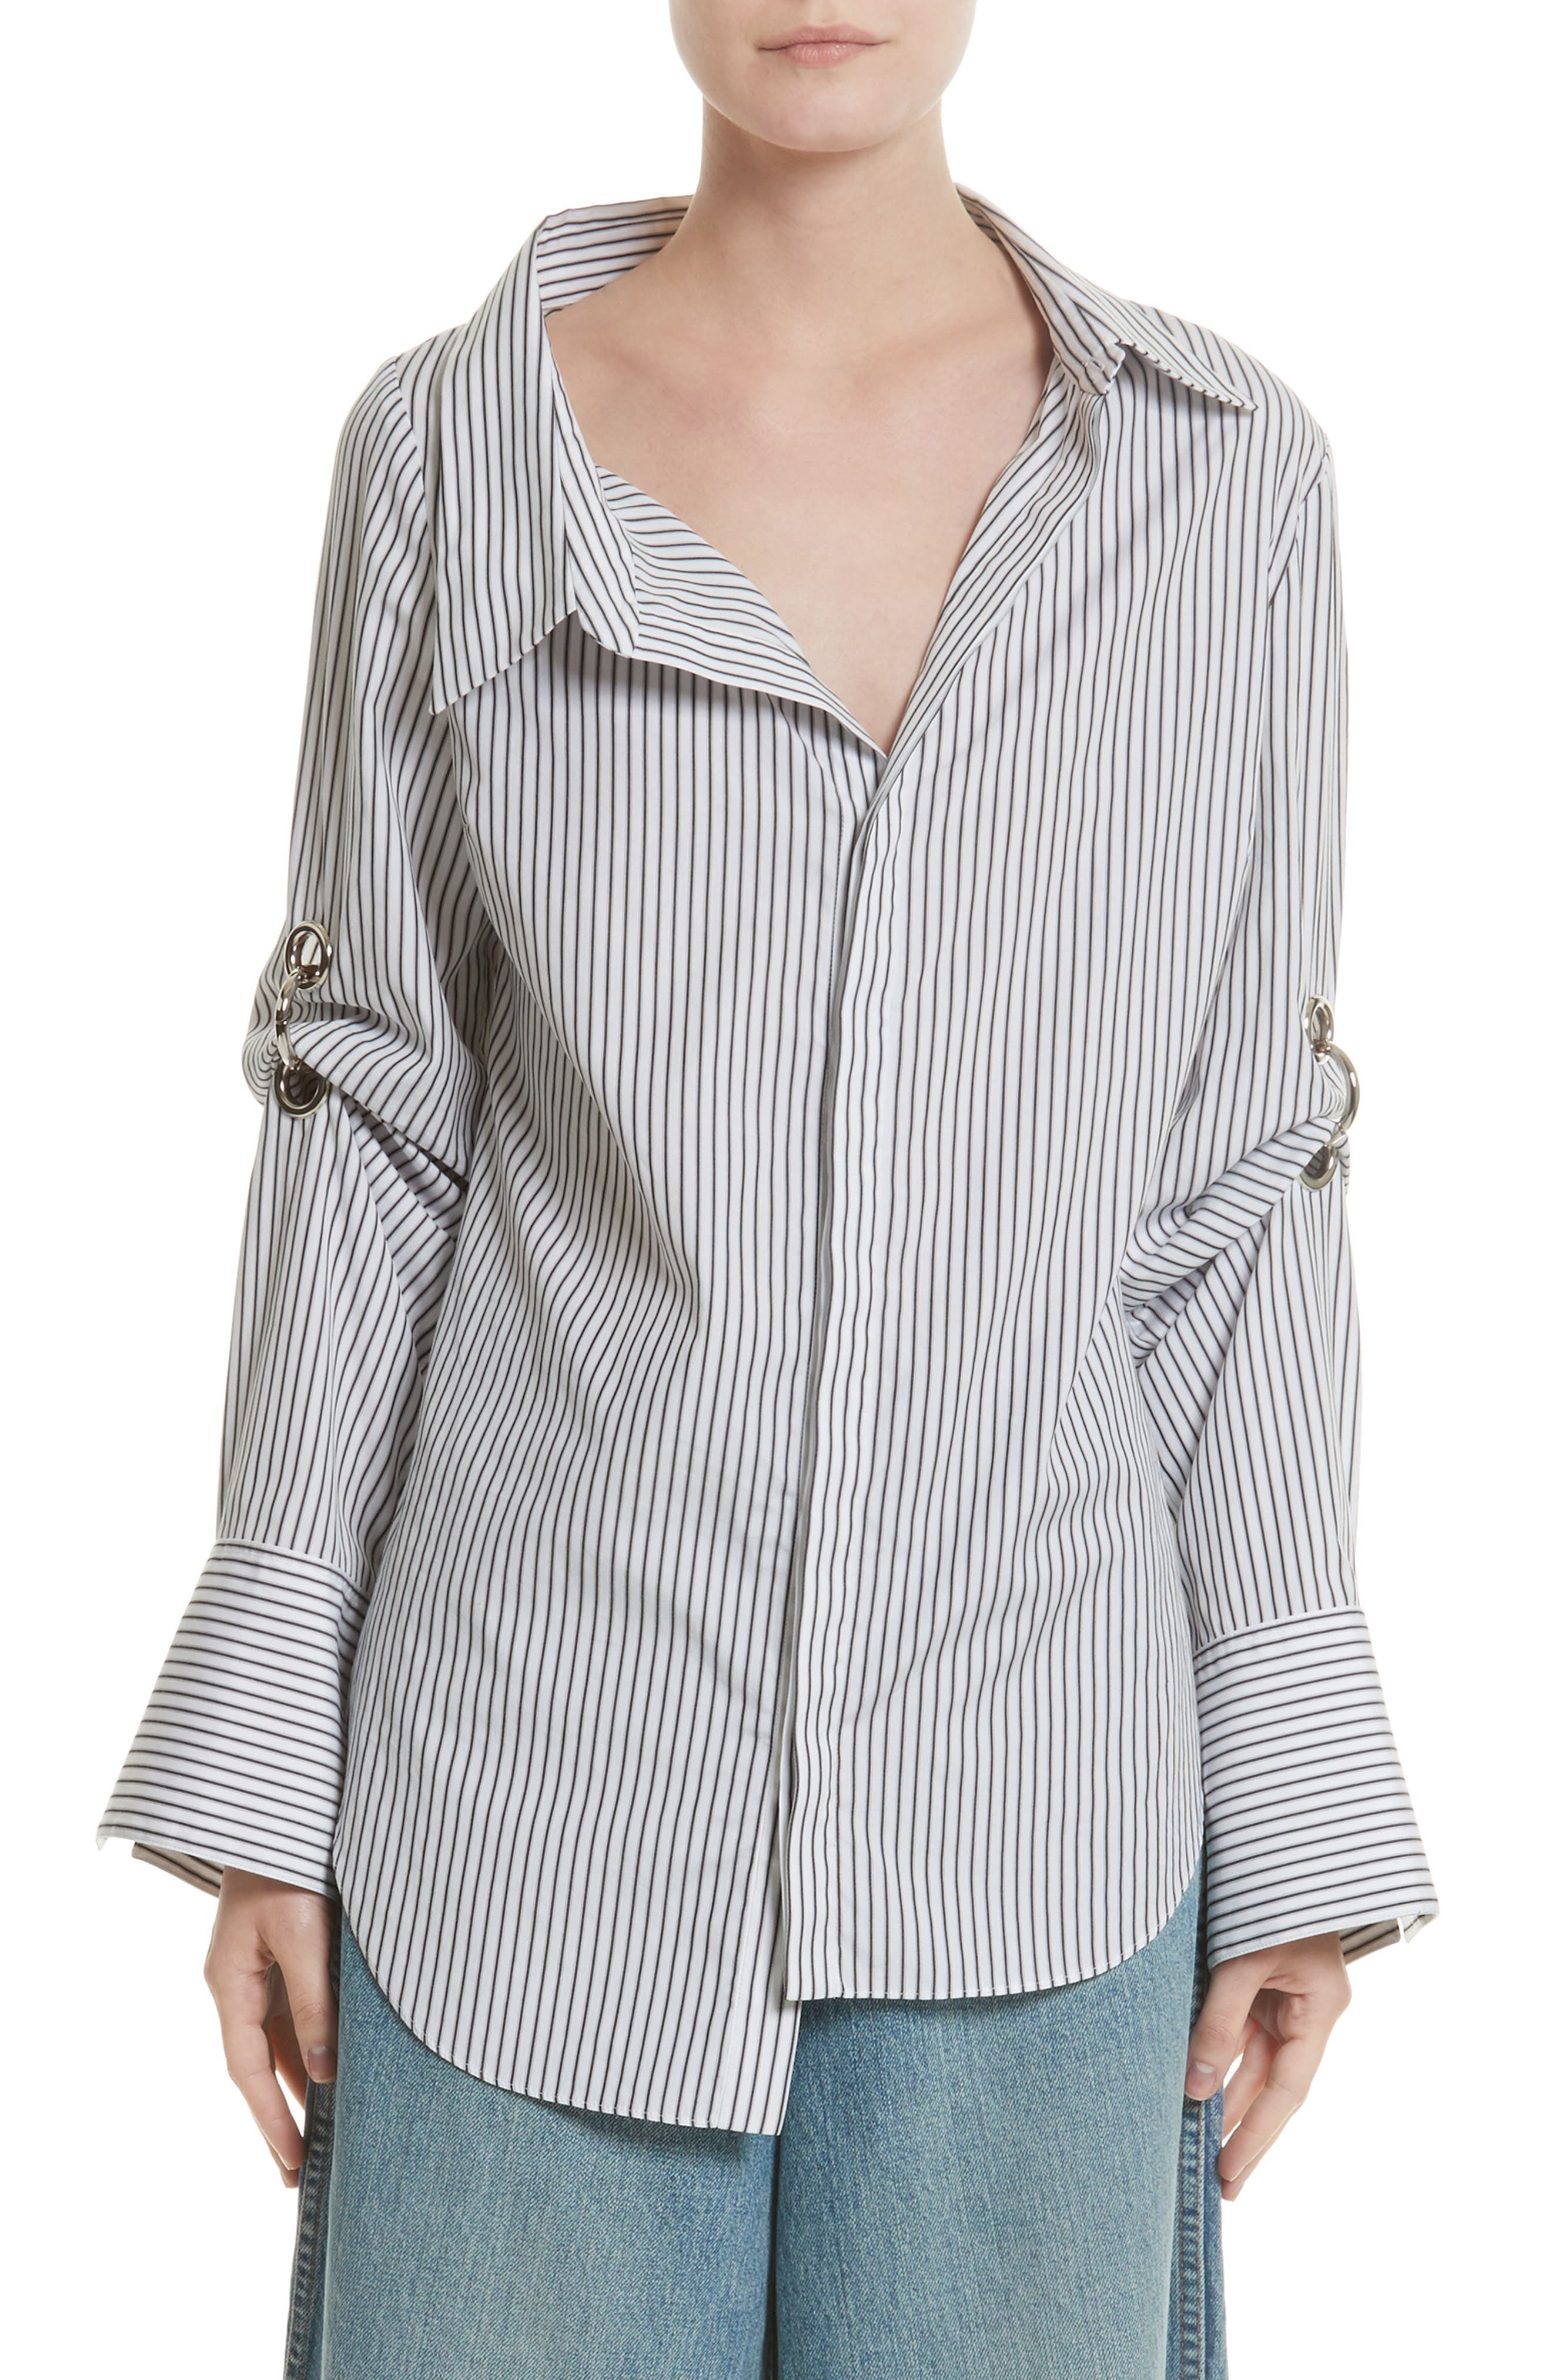 Grommet Scrunch Sleeve Shirt,                             Main thumbnail 1, color,                             Blue/ White